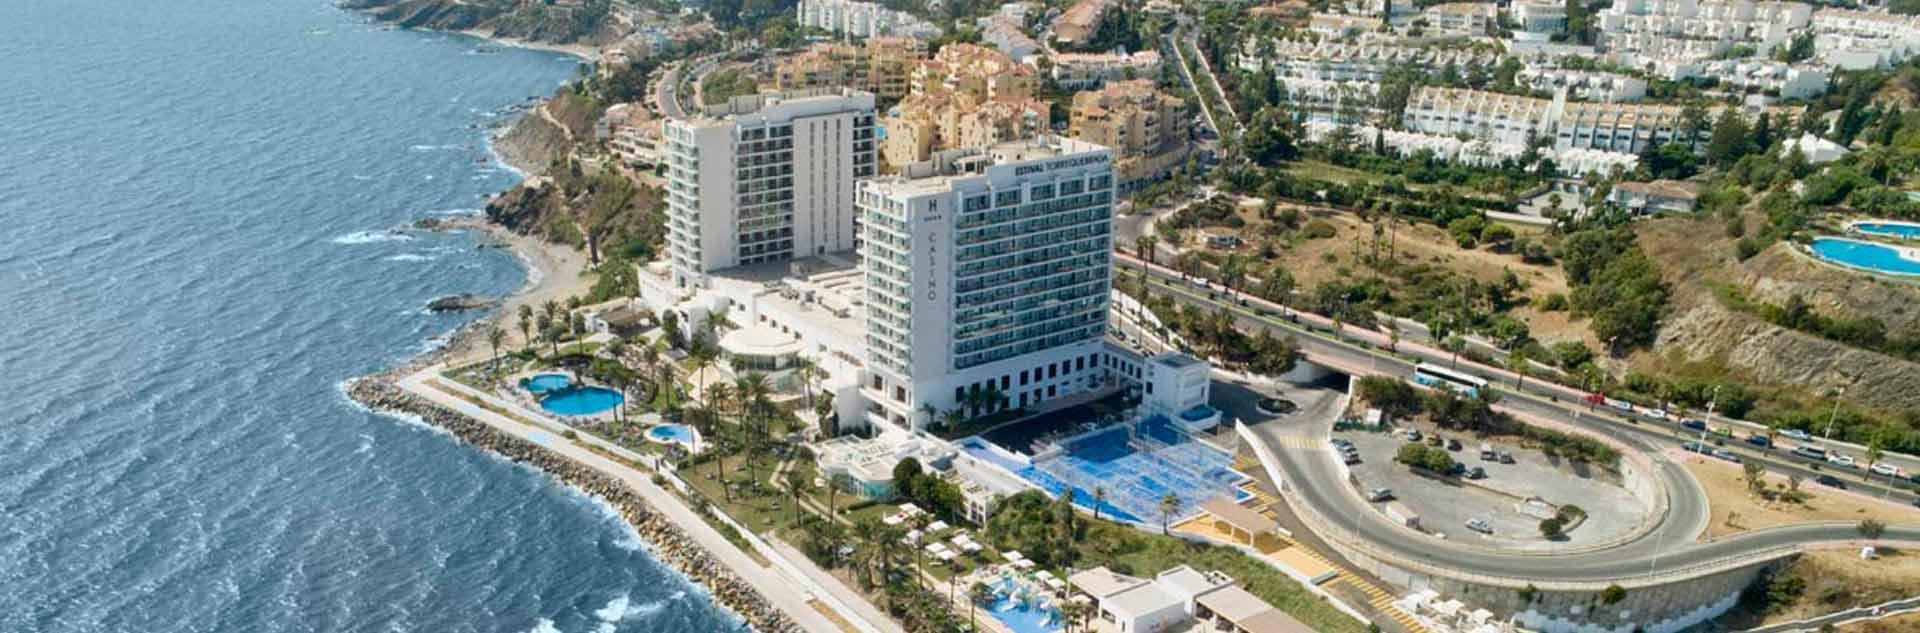 Vista aérea del hotel Estival Torrequebrada Benalmádena